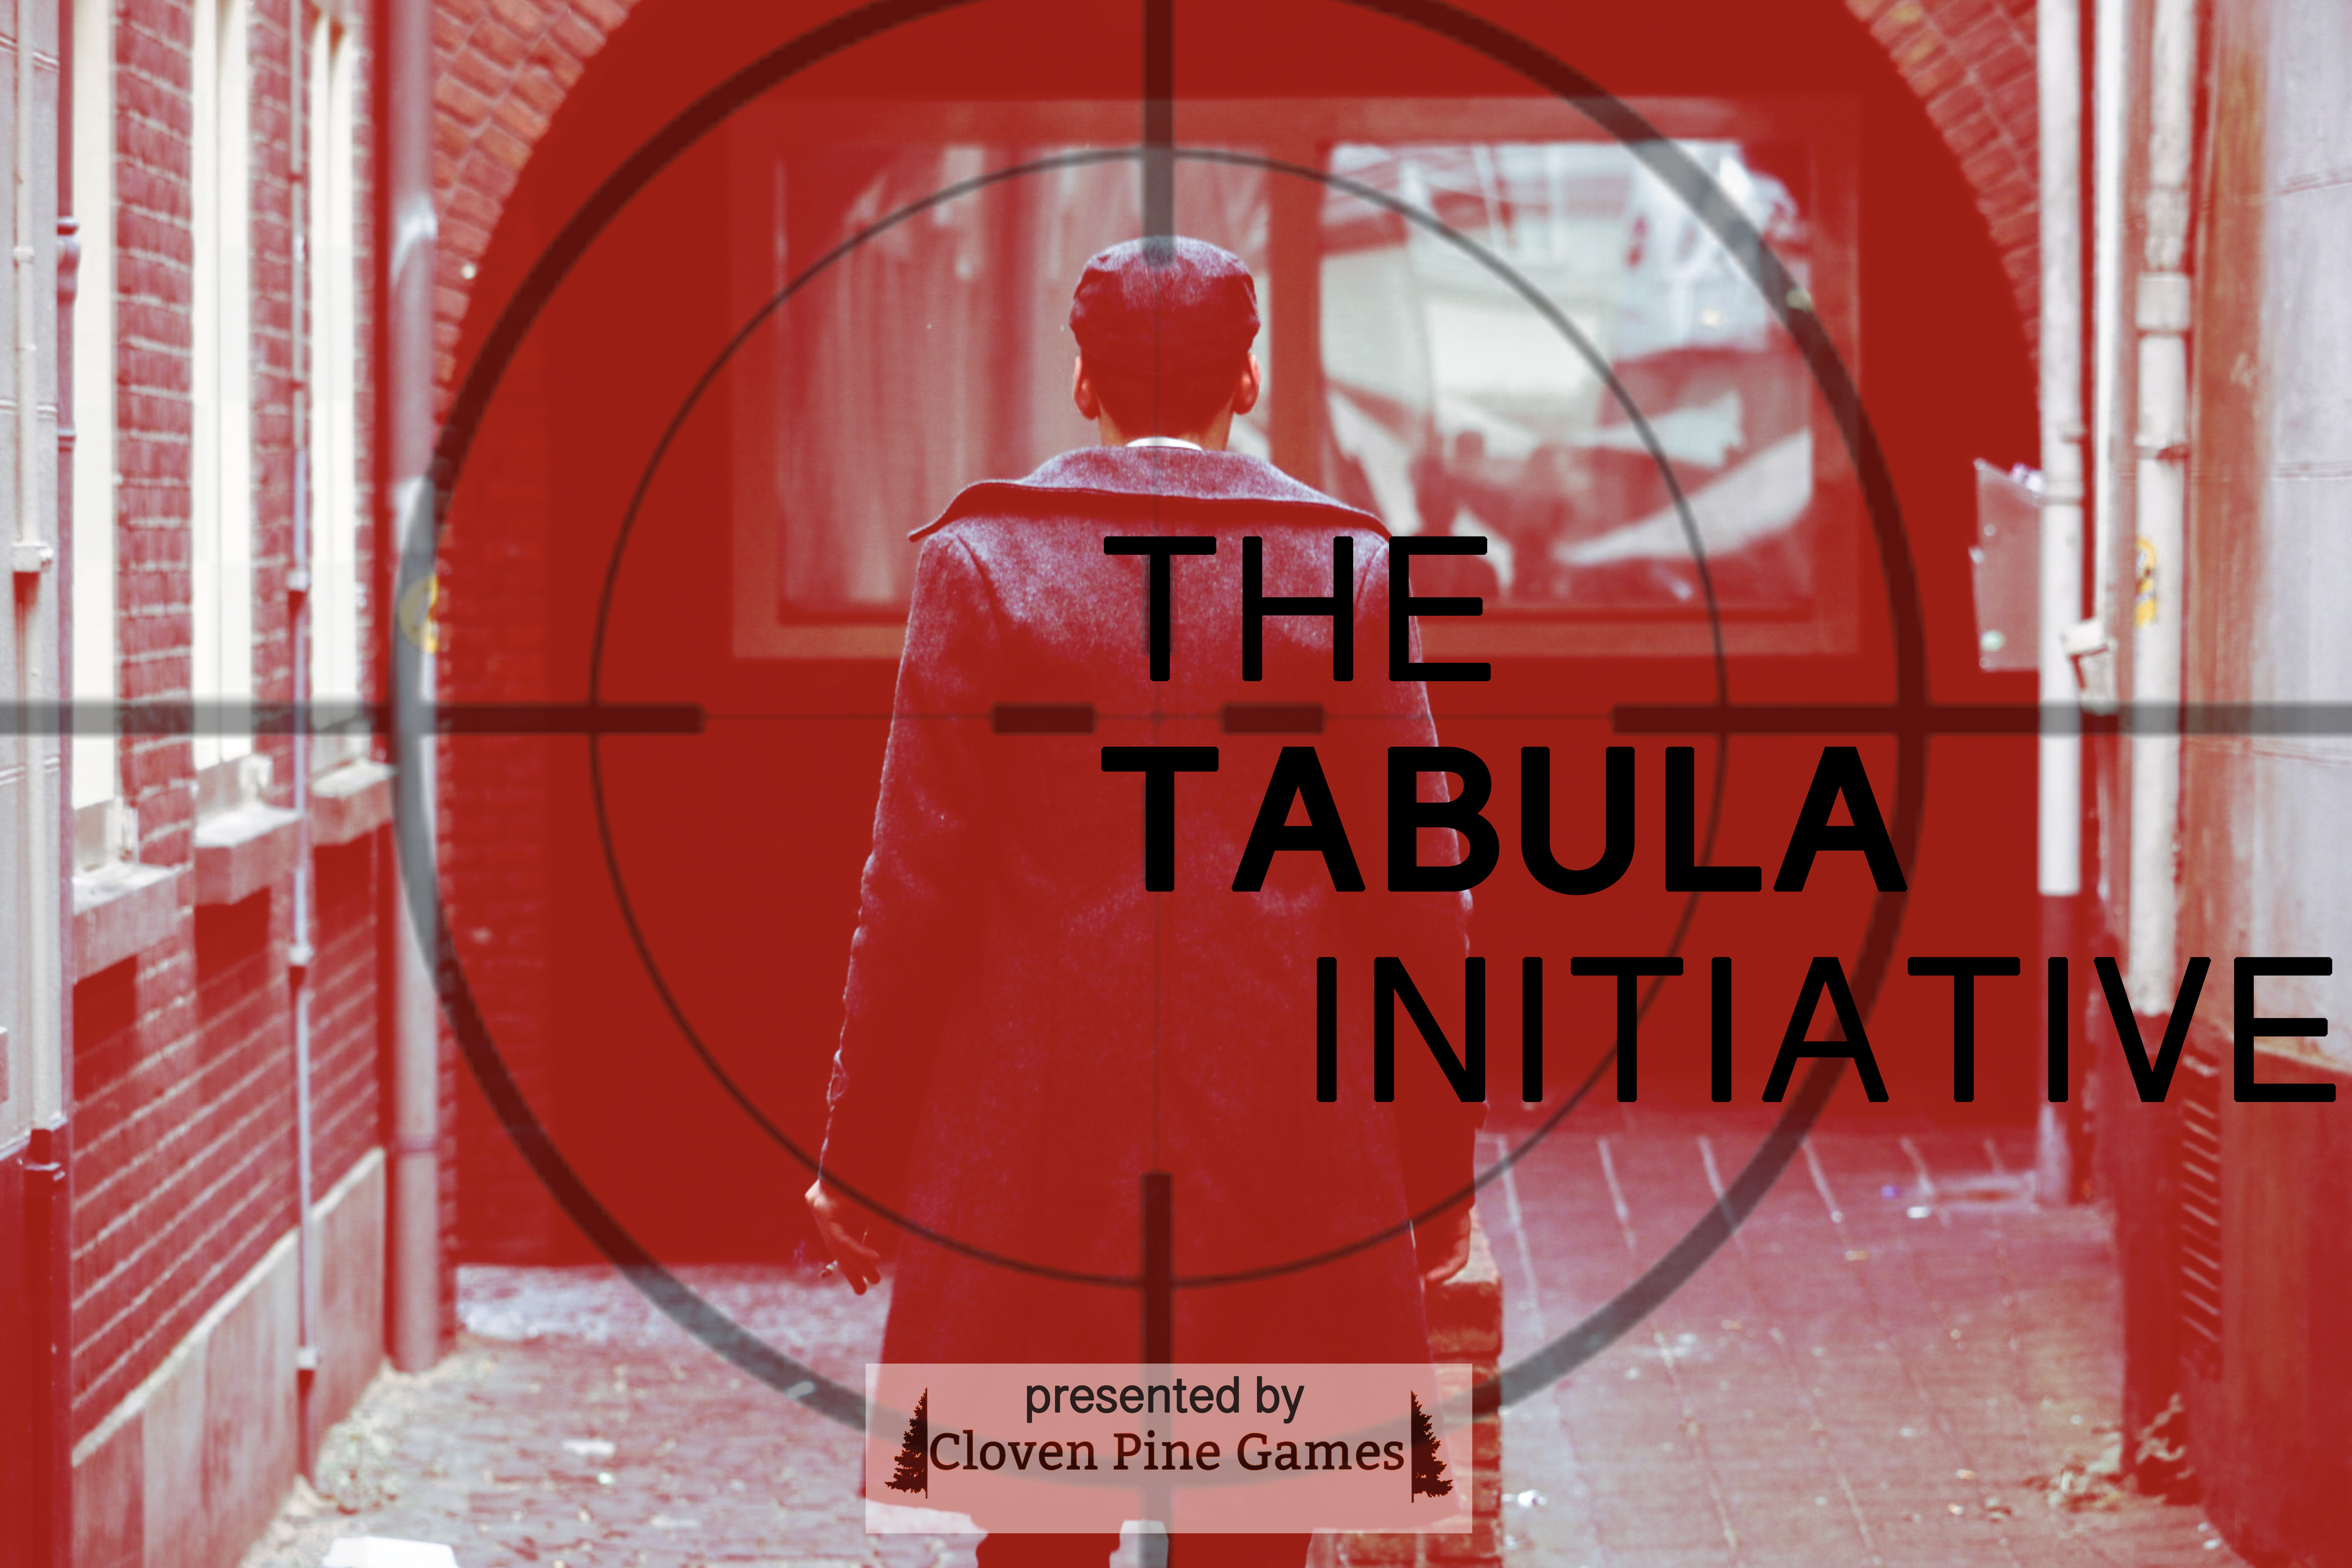 The Tabula Initiative